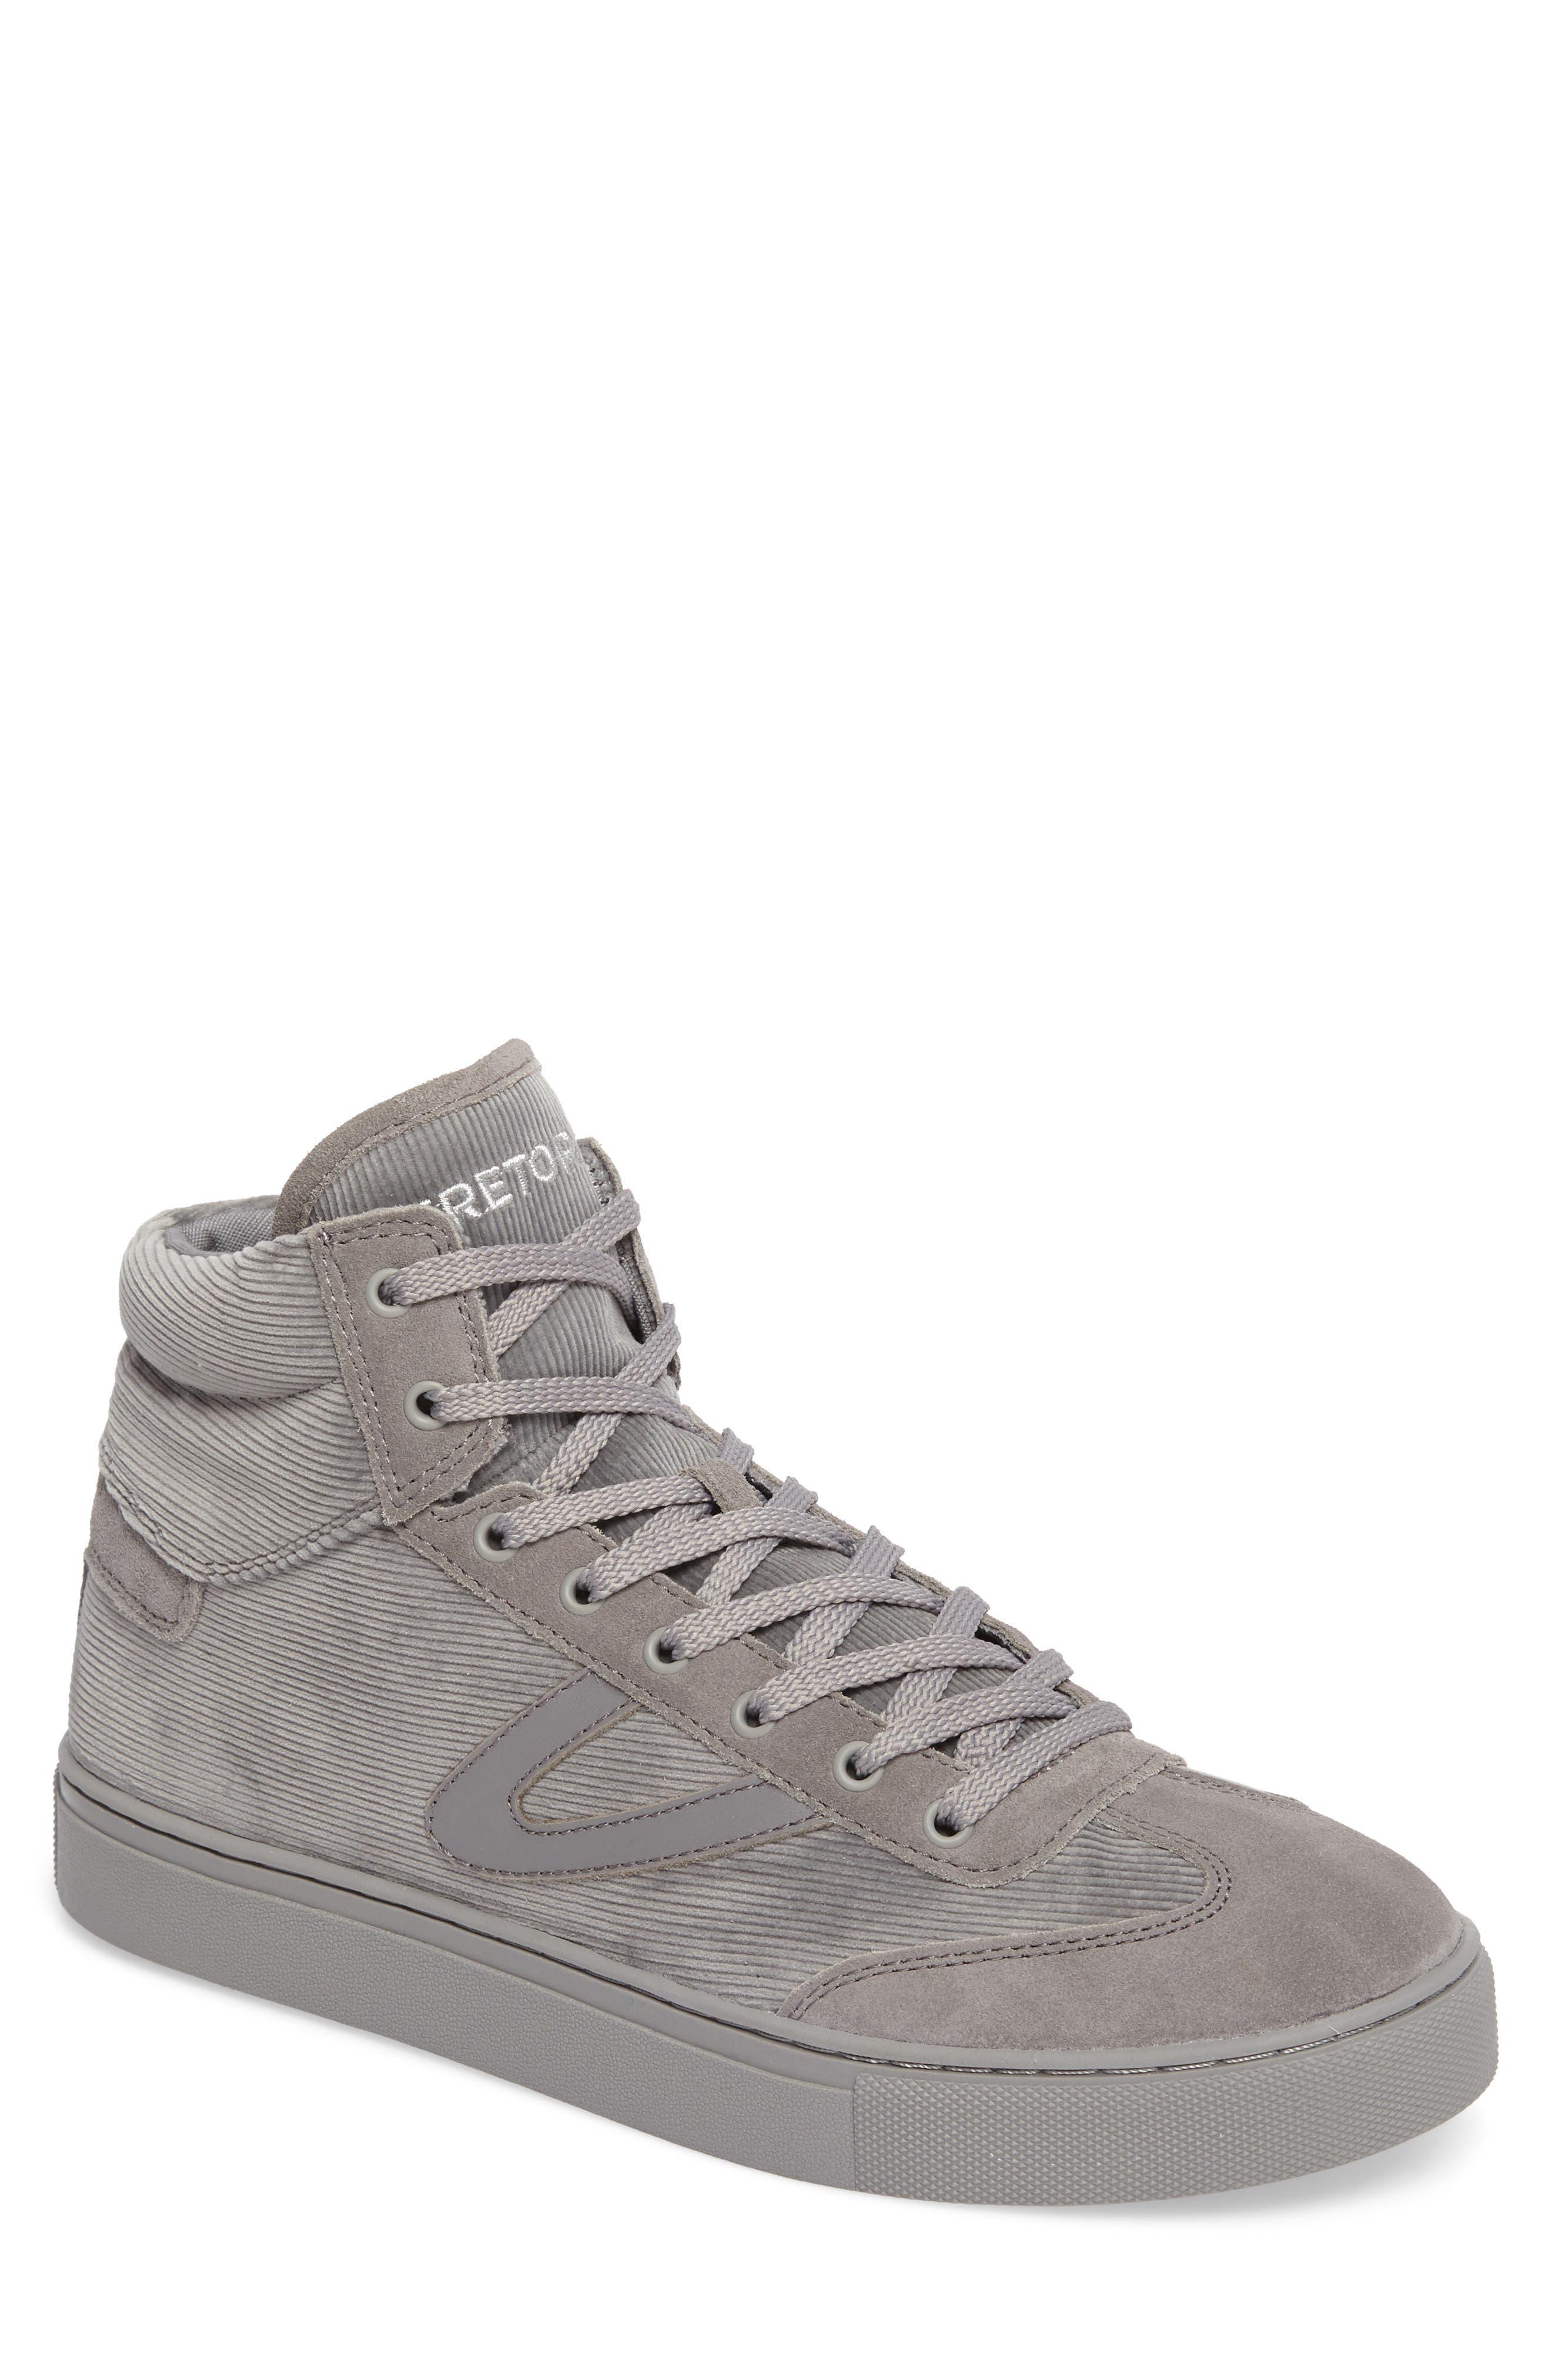 Jack High Top Sneaker,                             Main thumbnail 1, color,